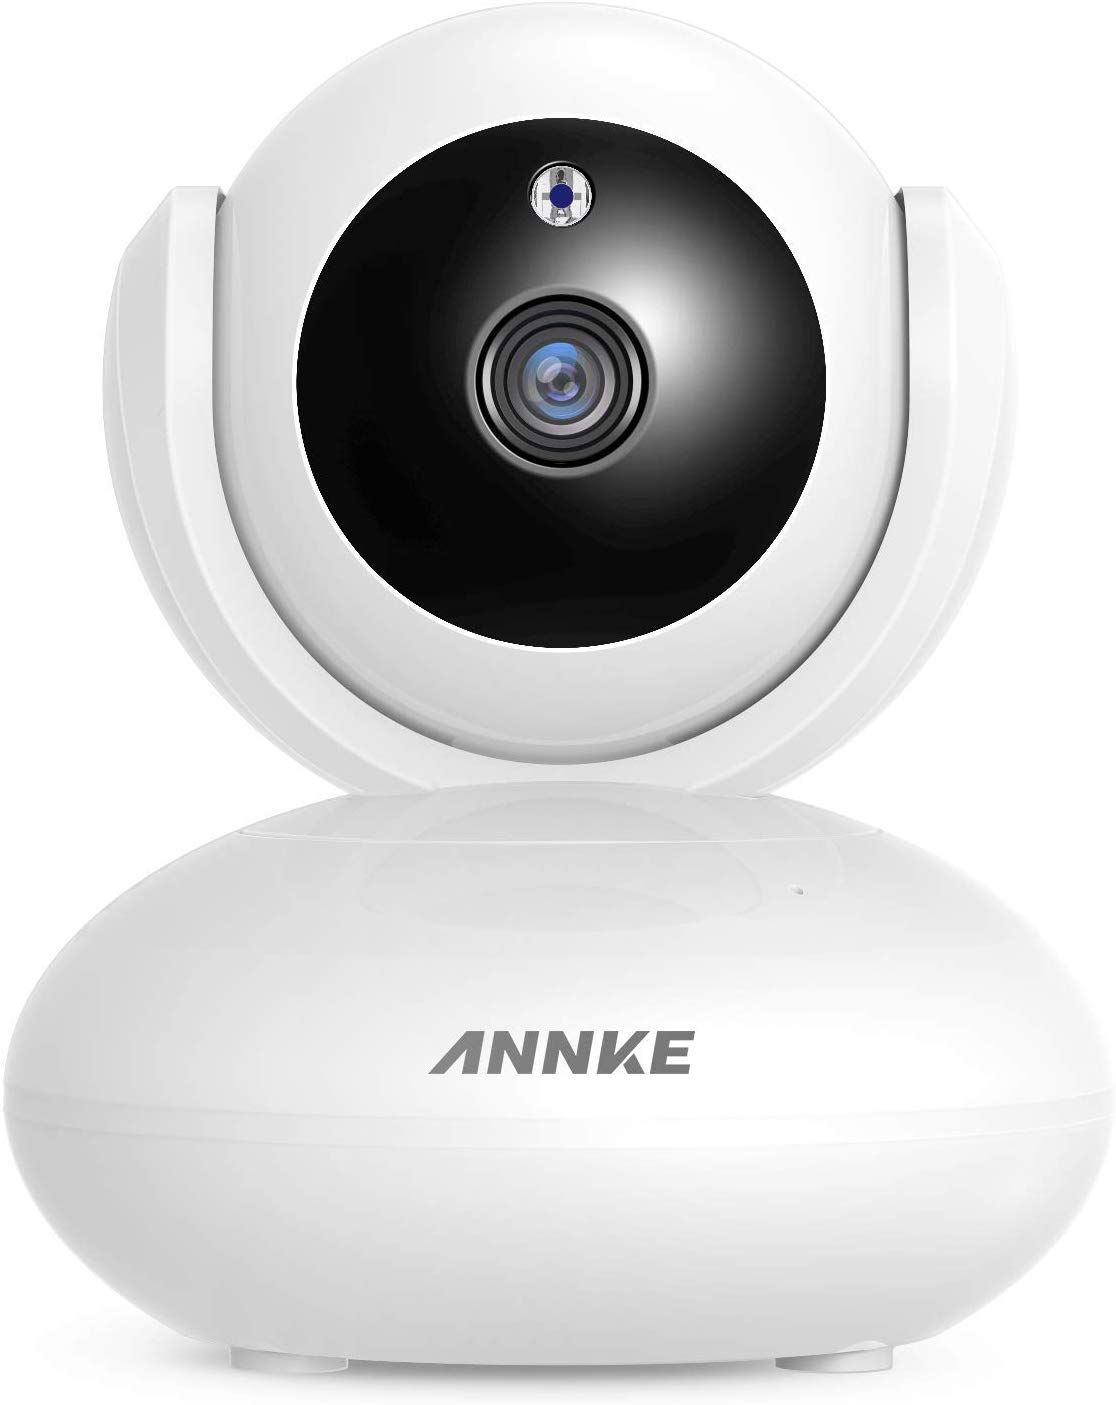 Annke Wireless Camera